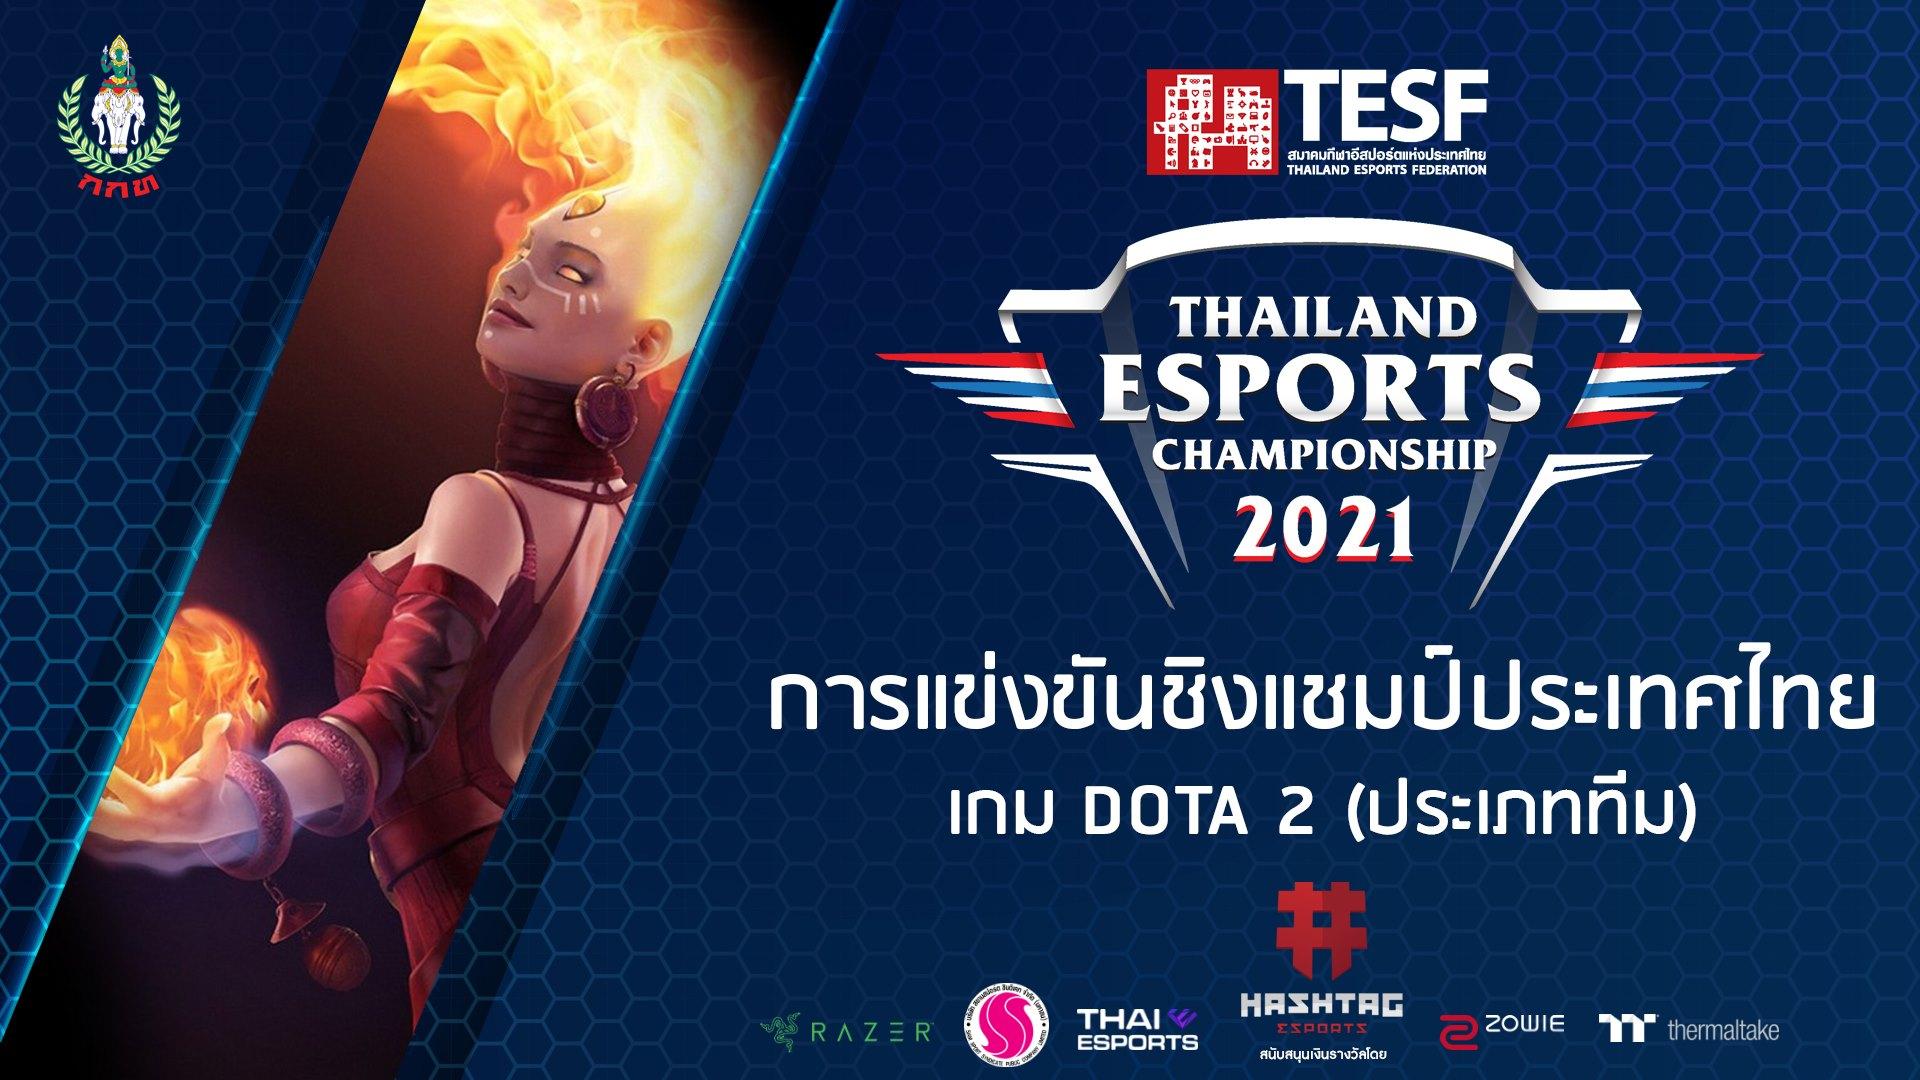 Thailand Esports 1082021 3